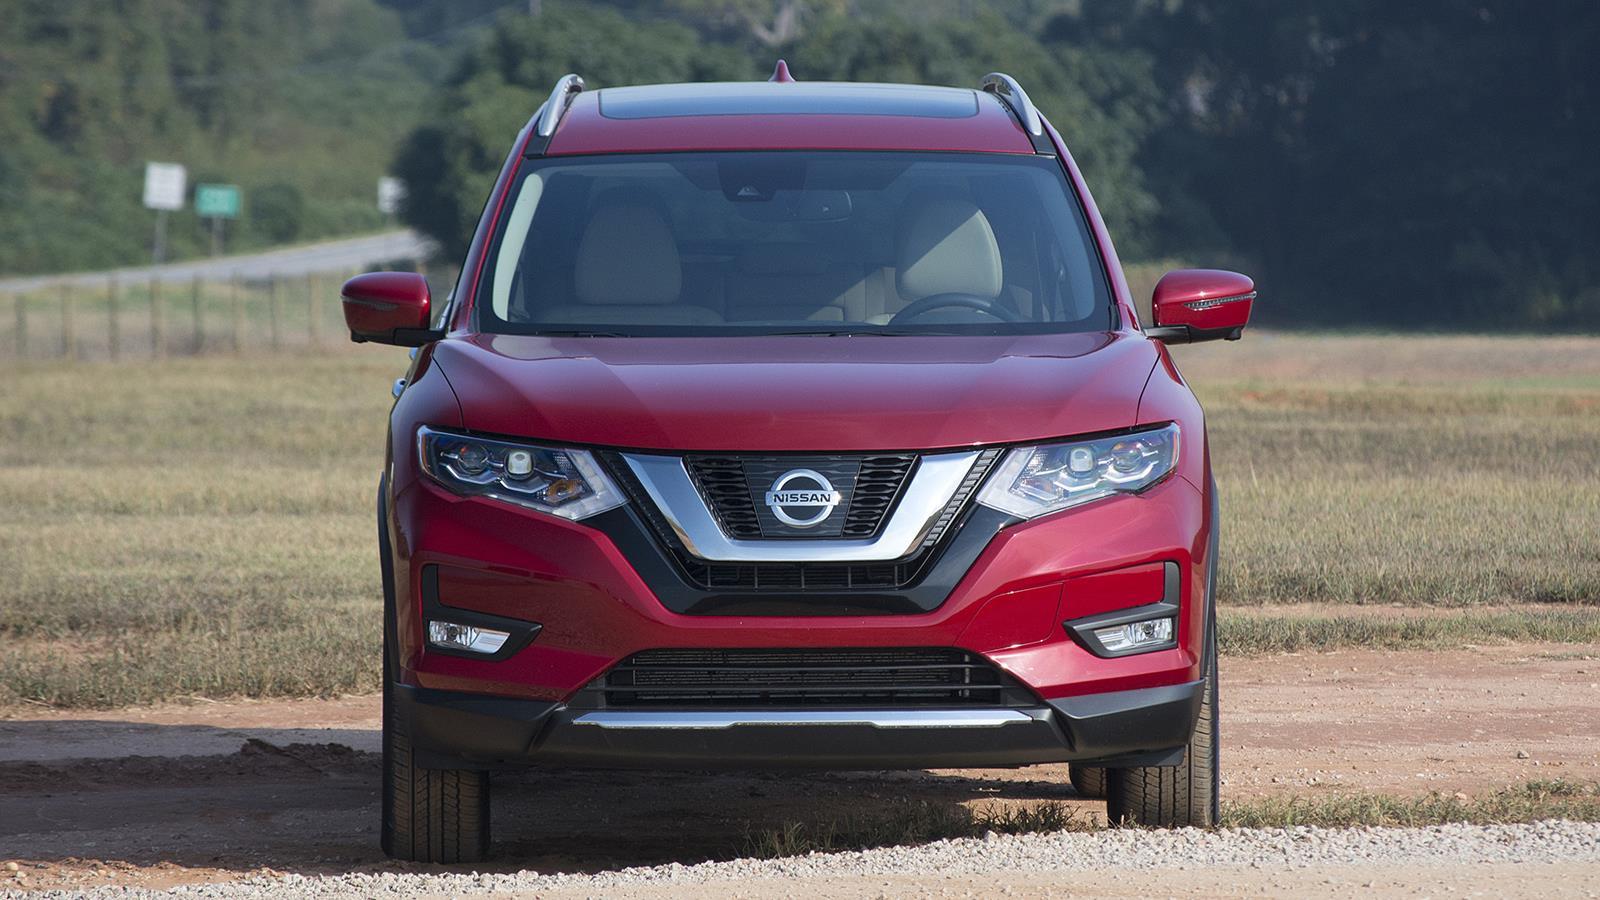 Nissan Rogue 2017 — фотогалерея